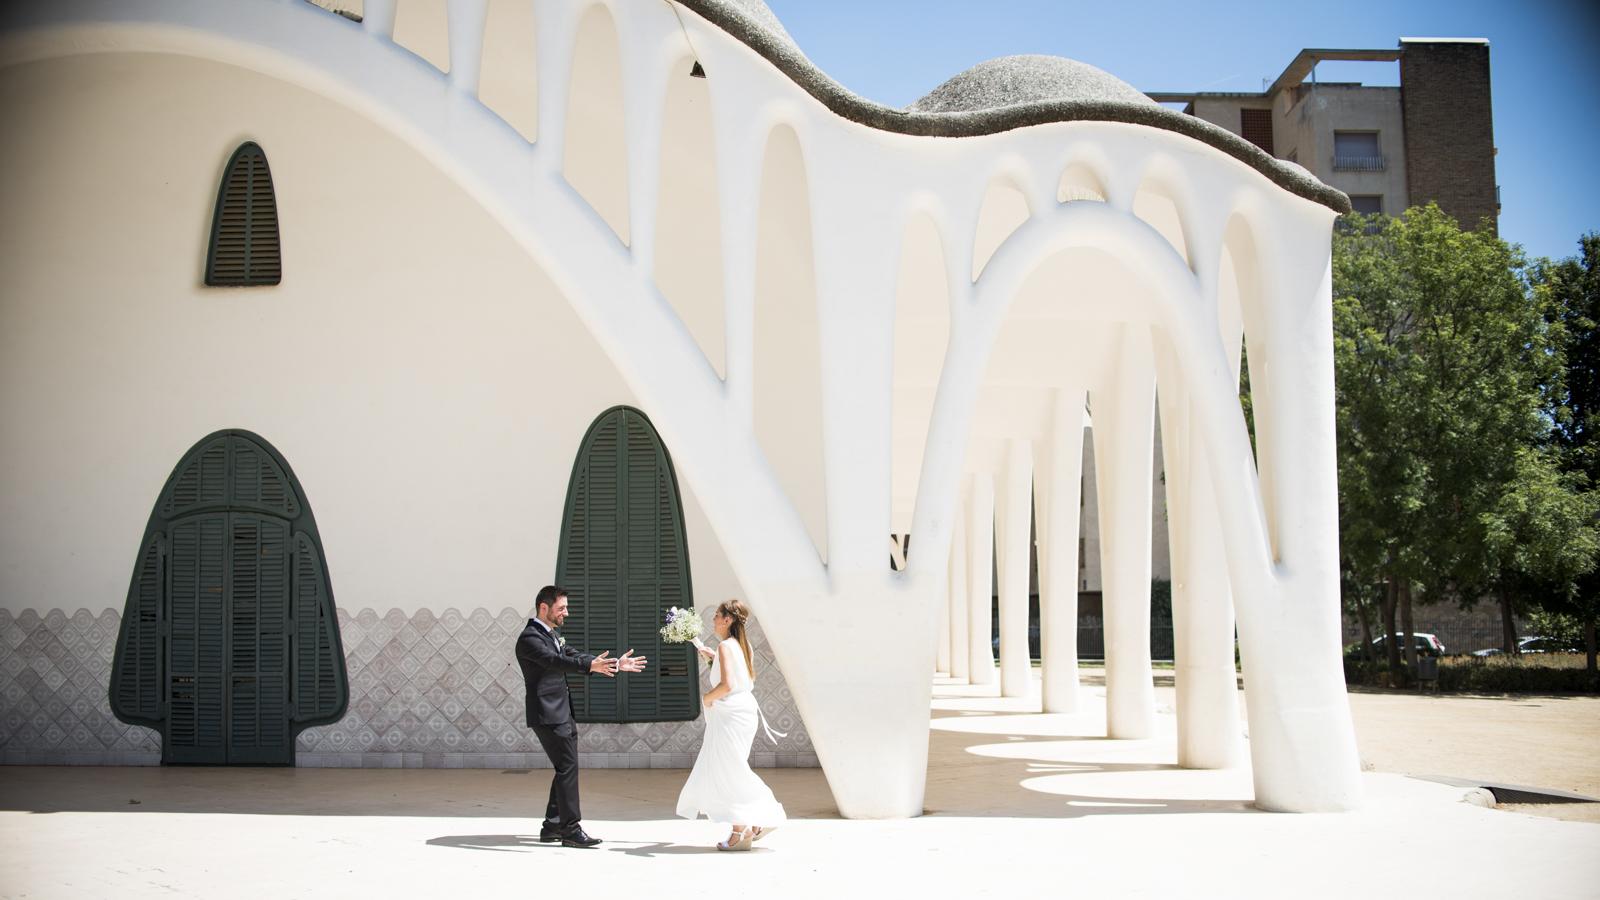 mia-moments-photo-boda-terrassa-mas-bonvilar-fotografia-150.jpg